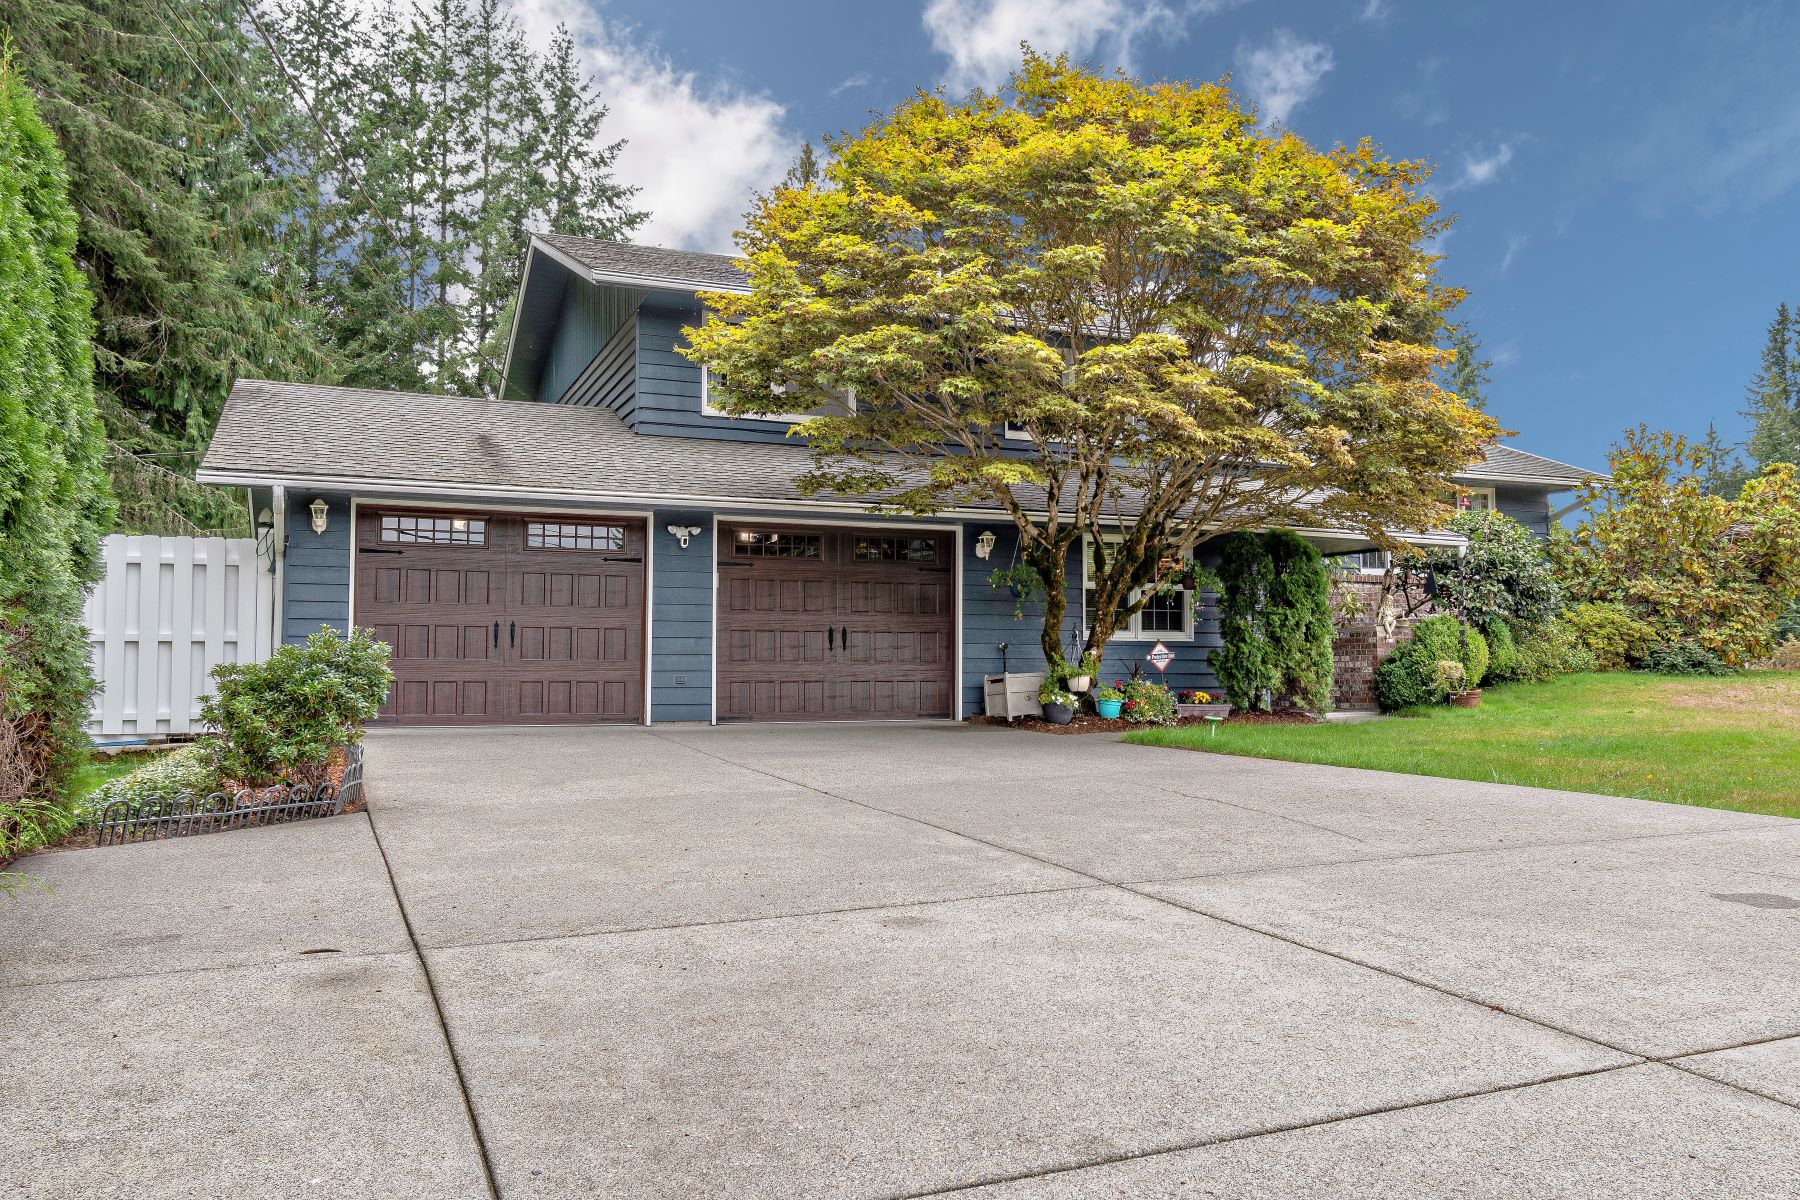 Single Family Homes for Sale at Arlington Heights 23902 127th Ave NE Arlington, Washington 98223 United States